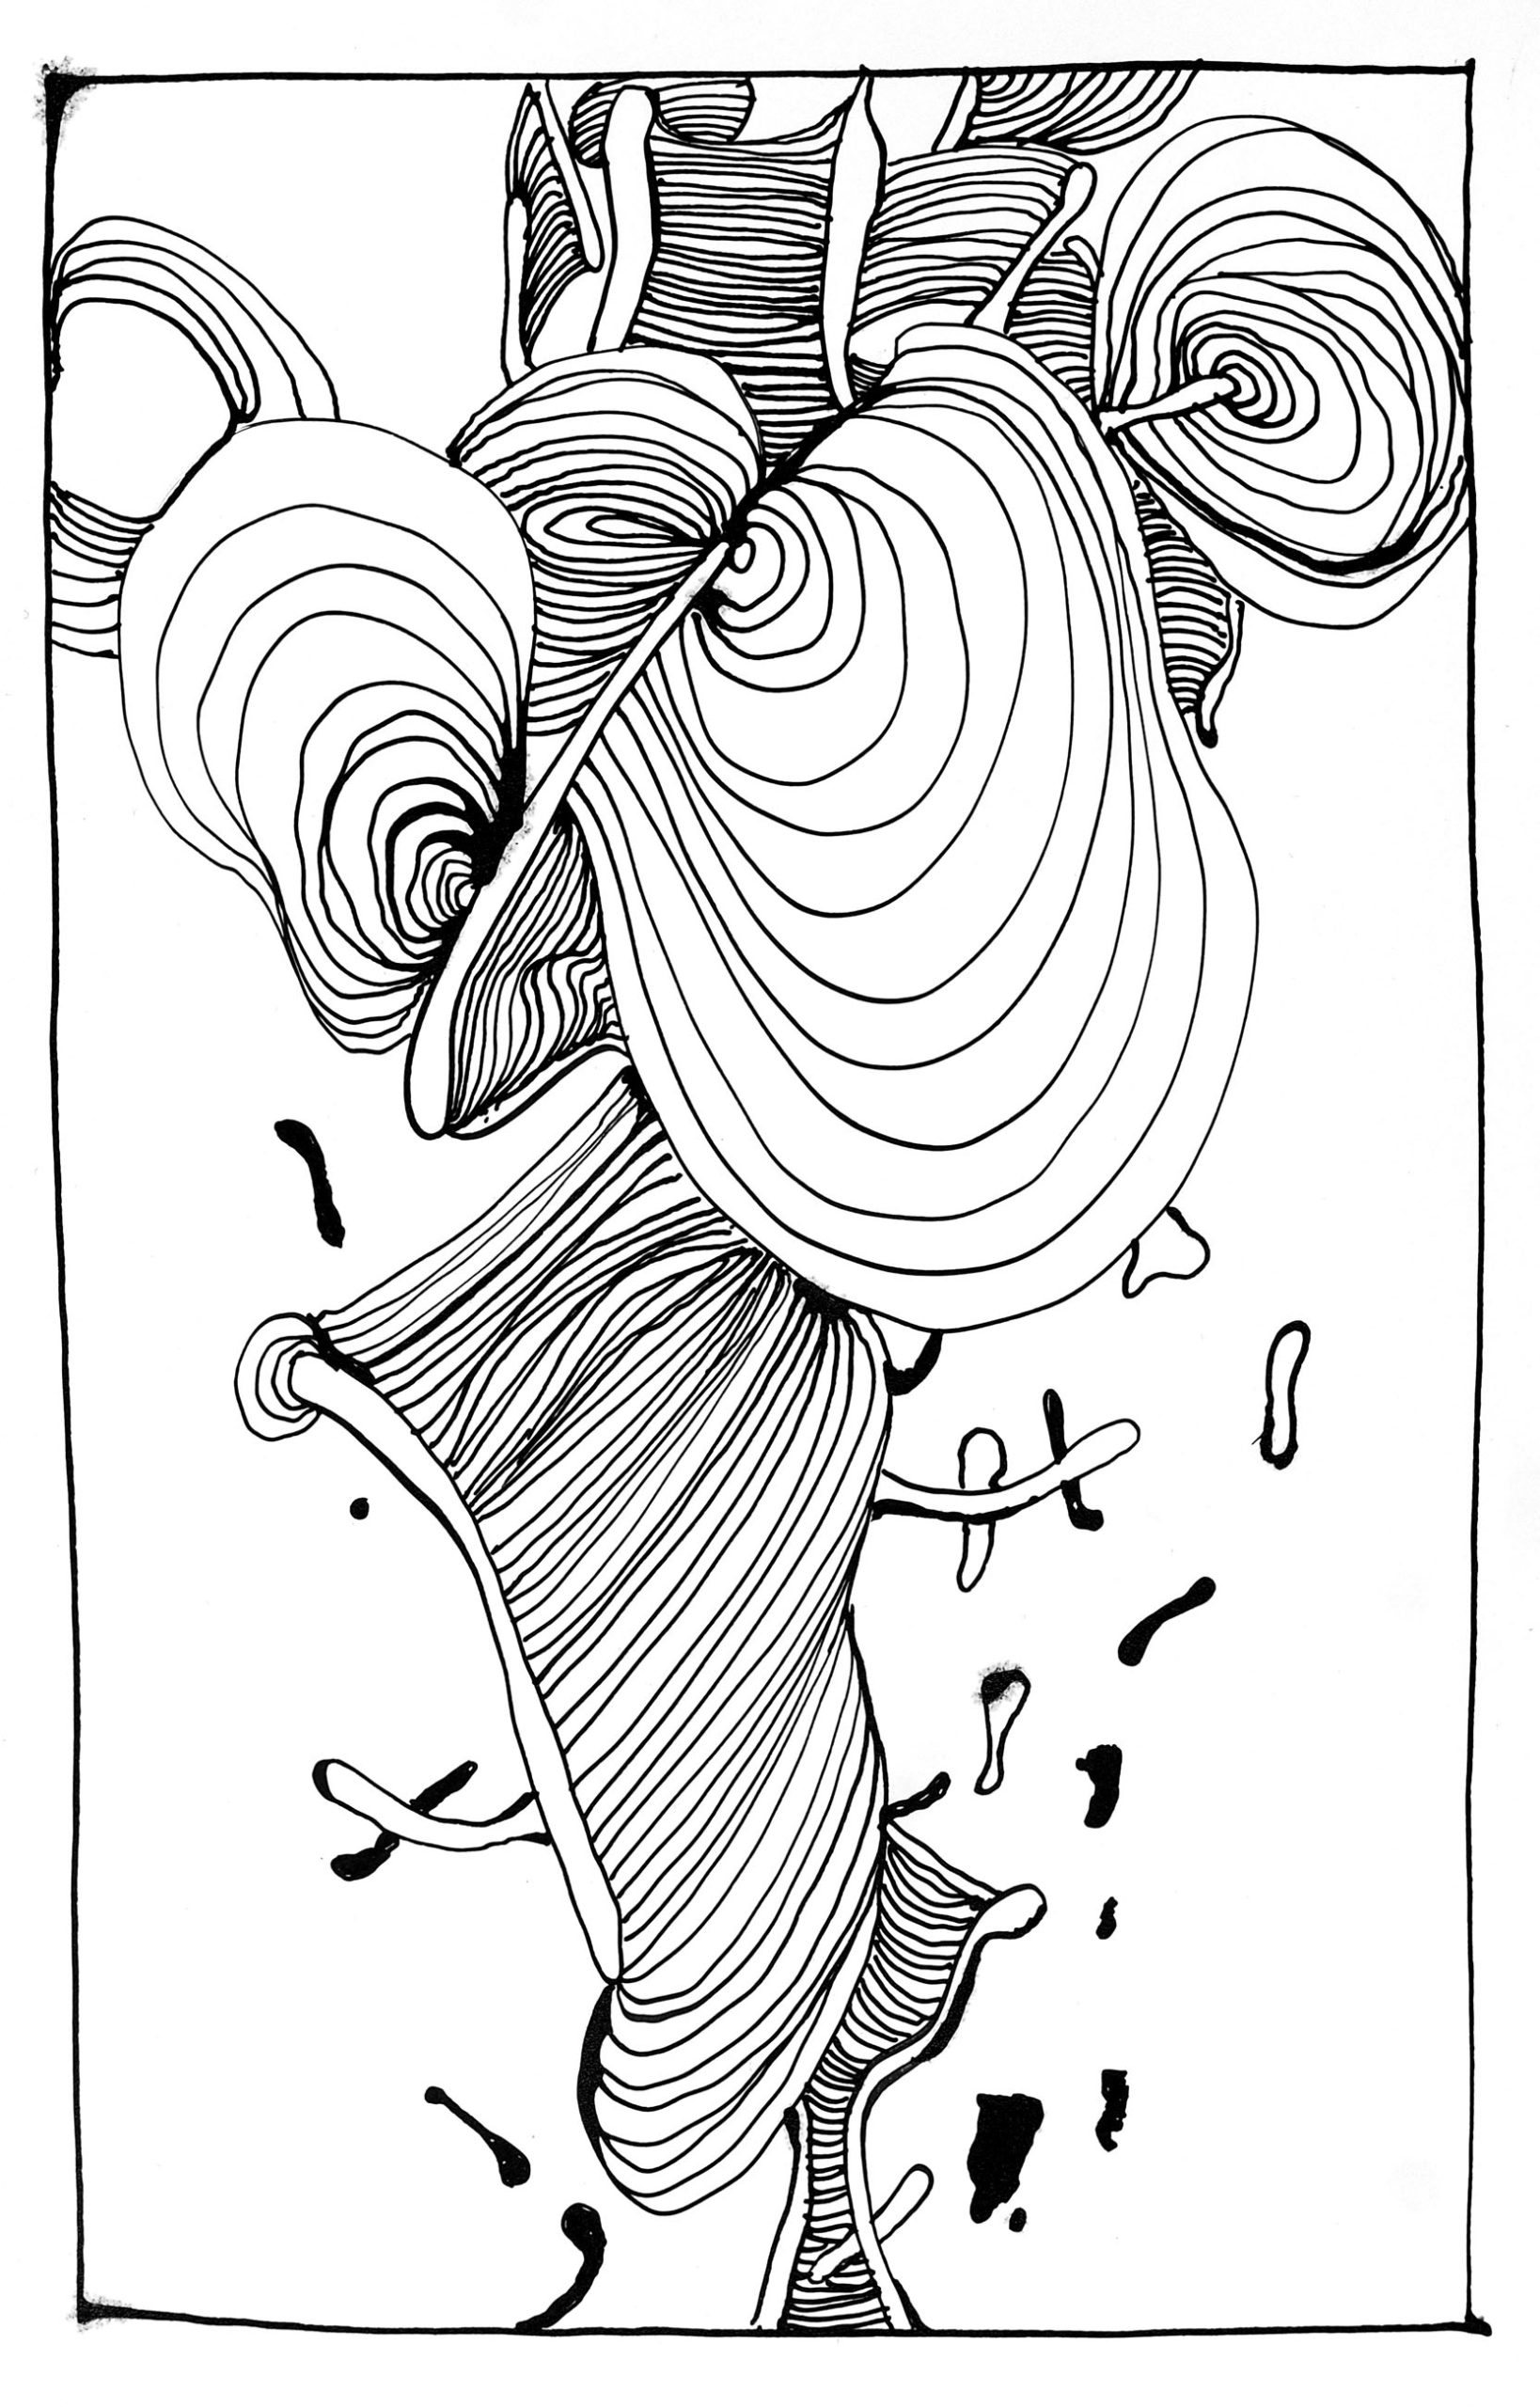 Artur Kepili Abstract drawings